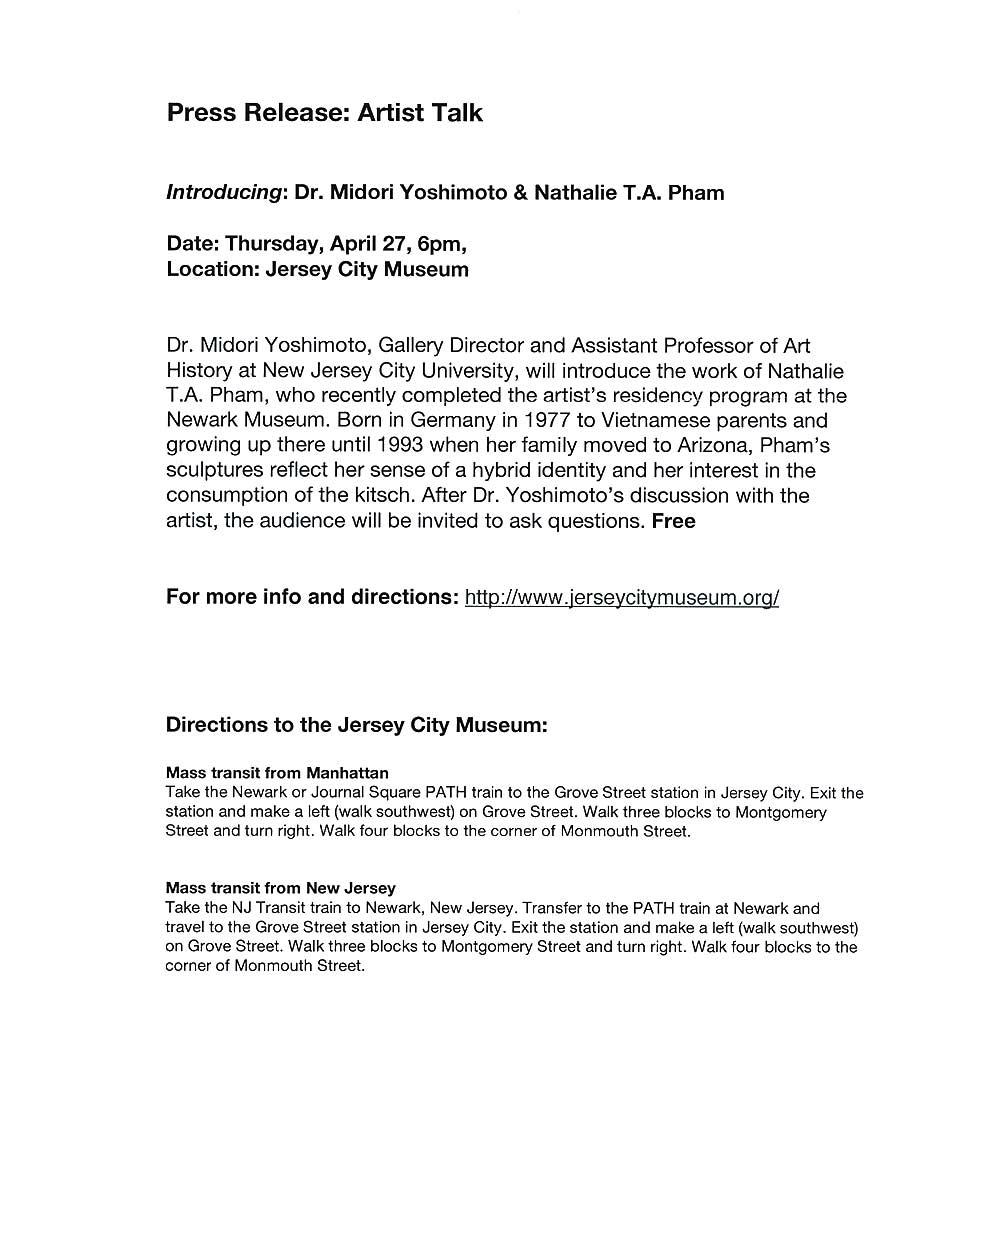 Artist Talk, press release